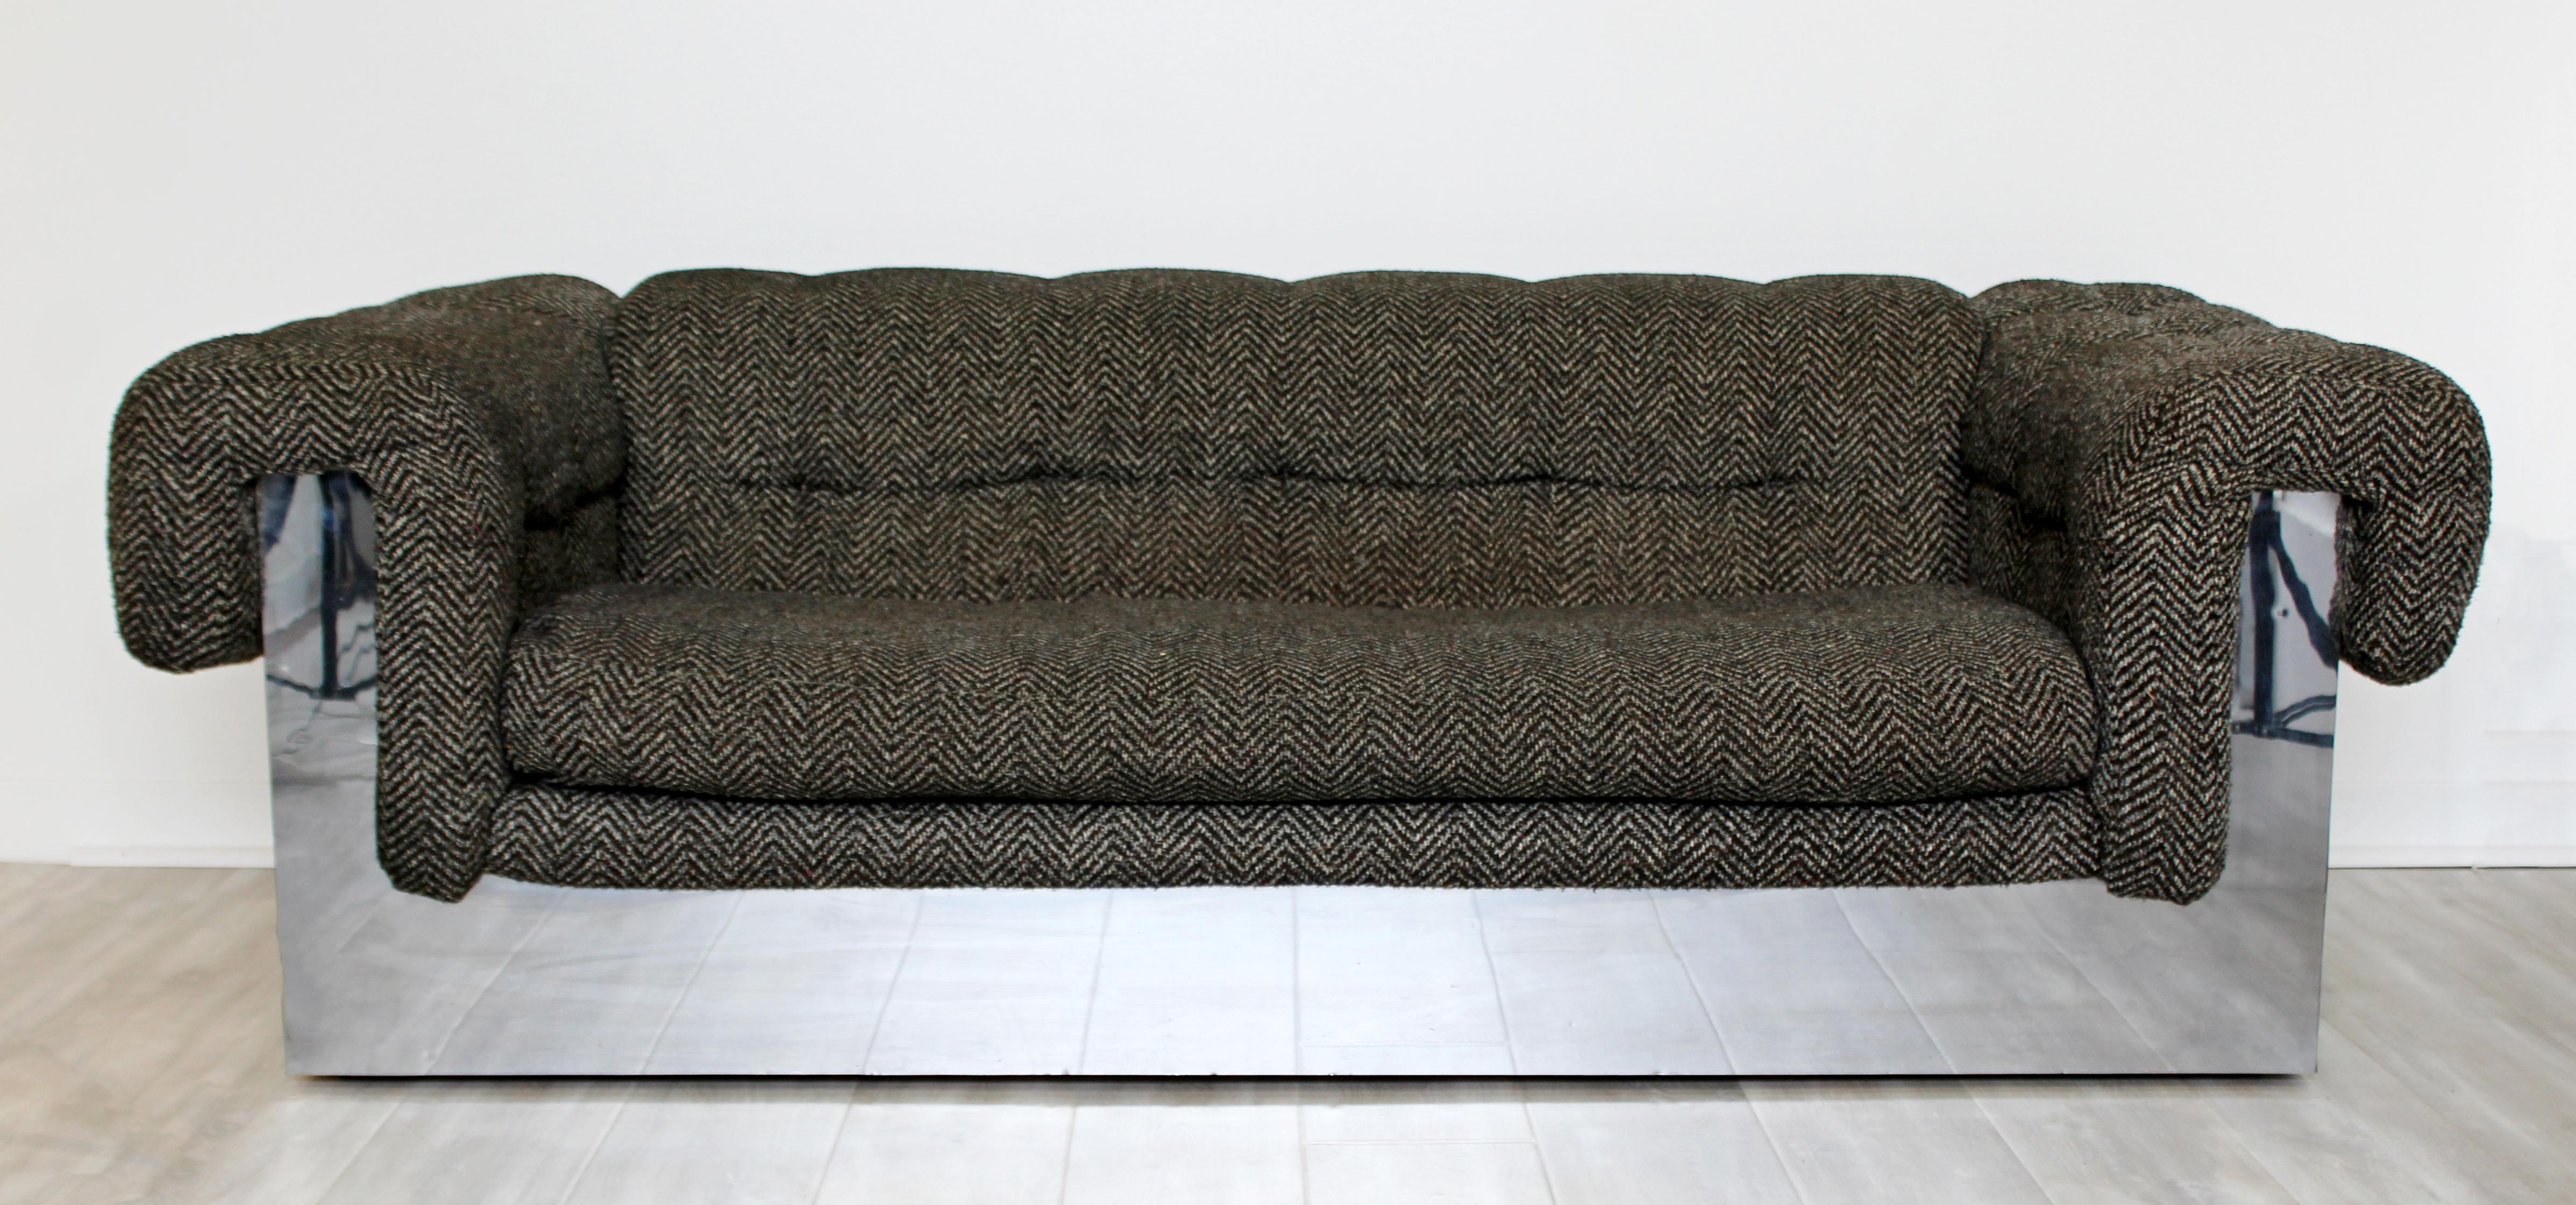 Mid Century Modern Milo Baughman Chrome Wrapped Tufted Sofa Loveseat, 1970s